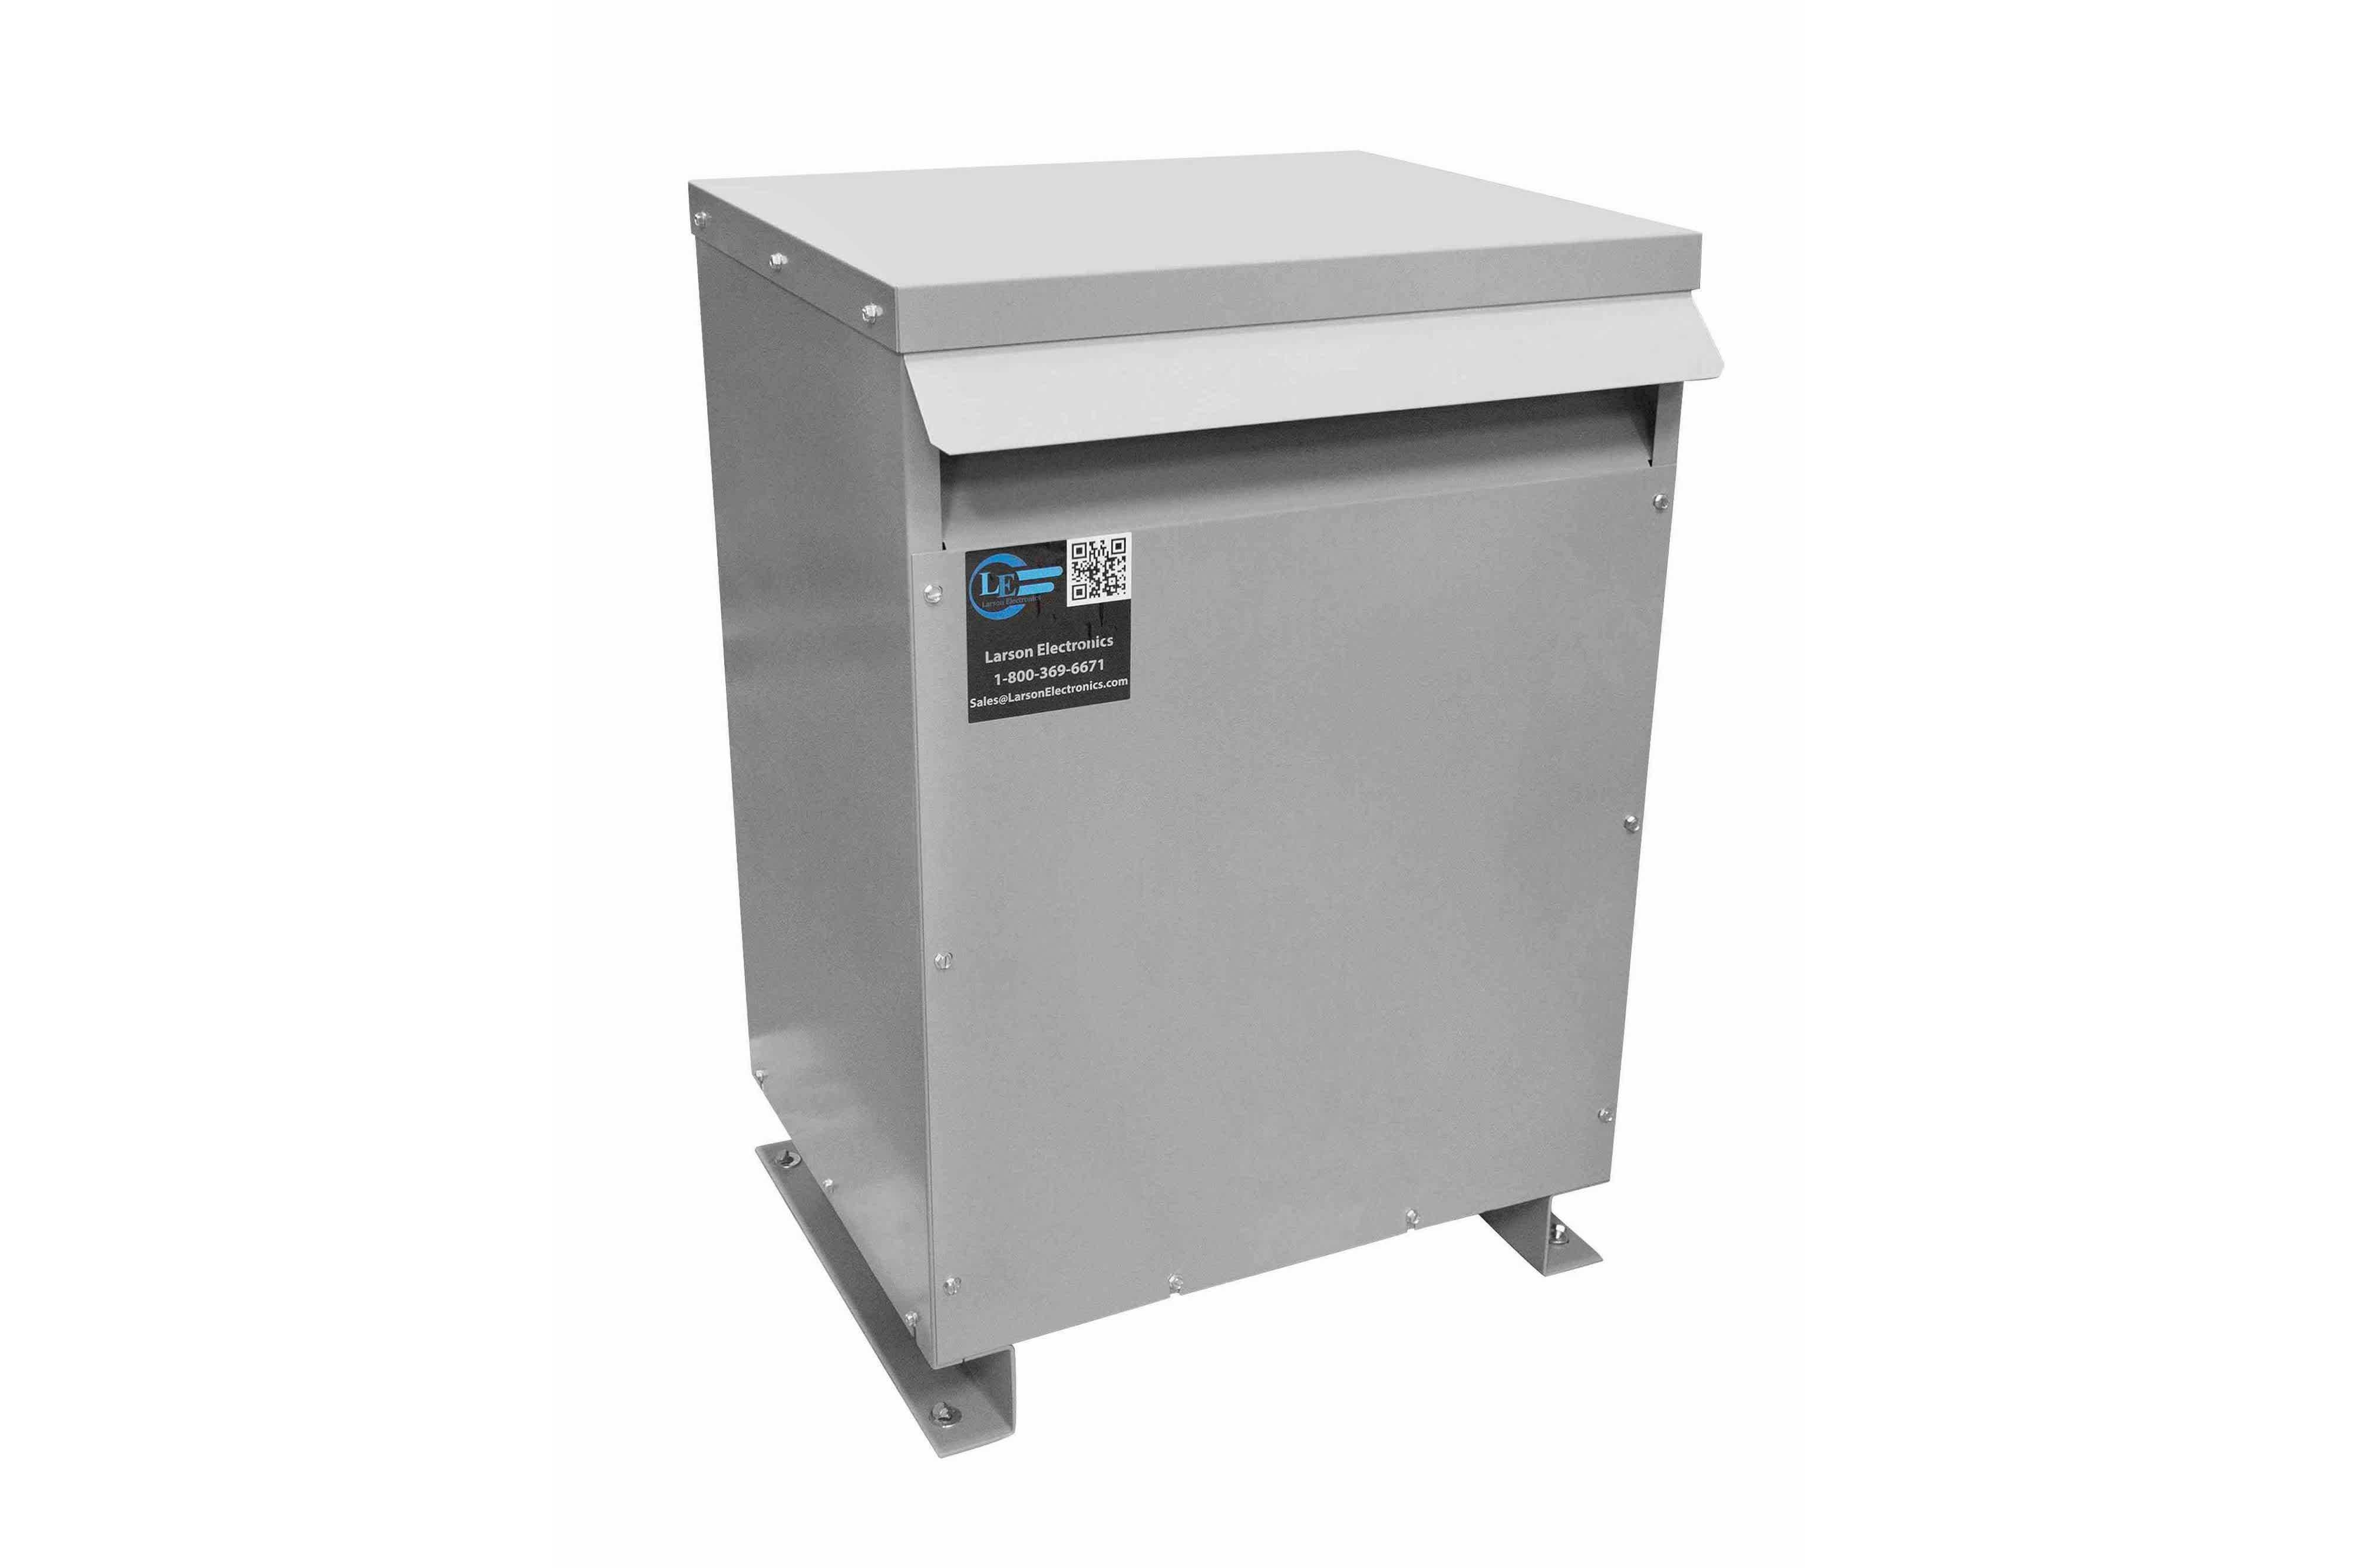 100 kVA 3PH Isolation Transformer, 208V Wye Primary, 380Y/220 Wye-N Secondary, N3R, Ventilated, 60 Hz